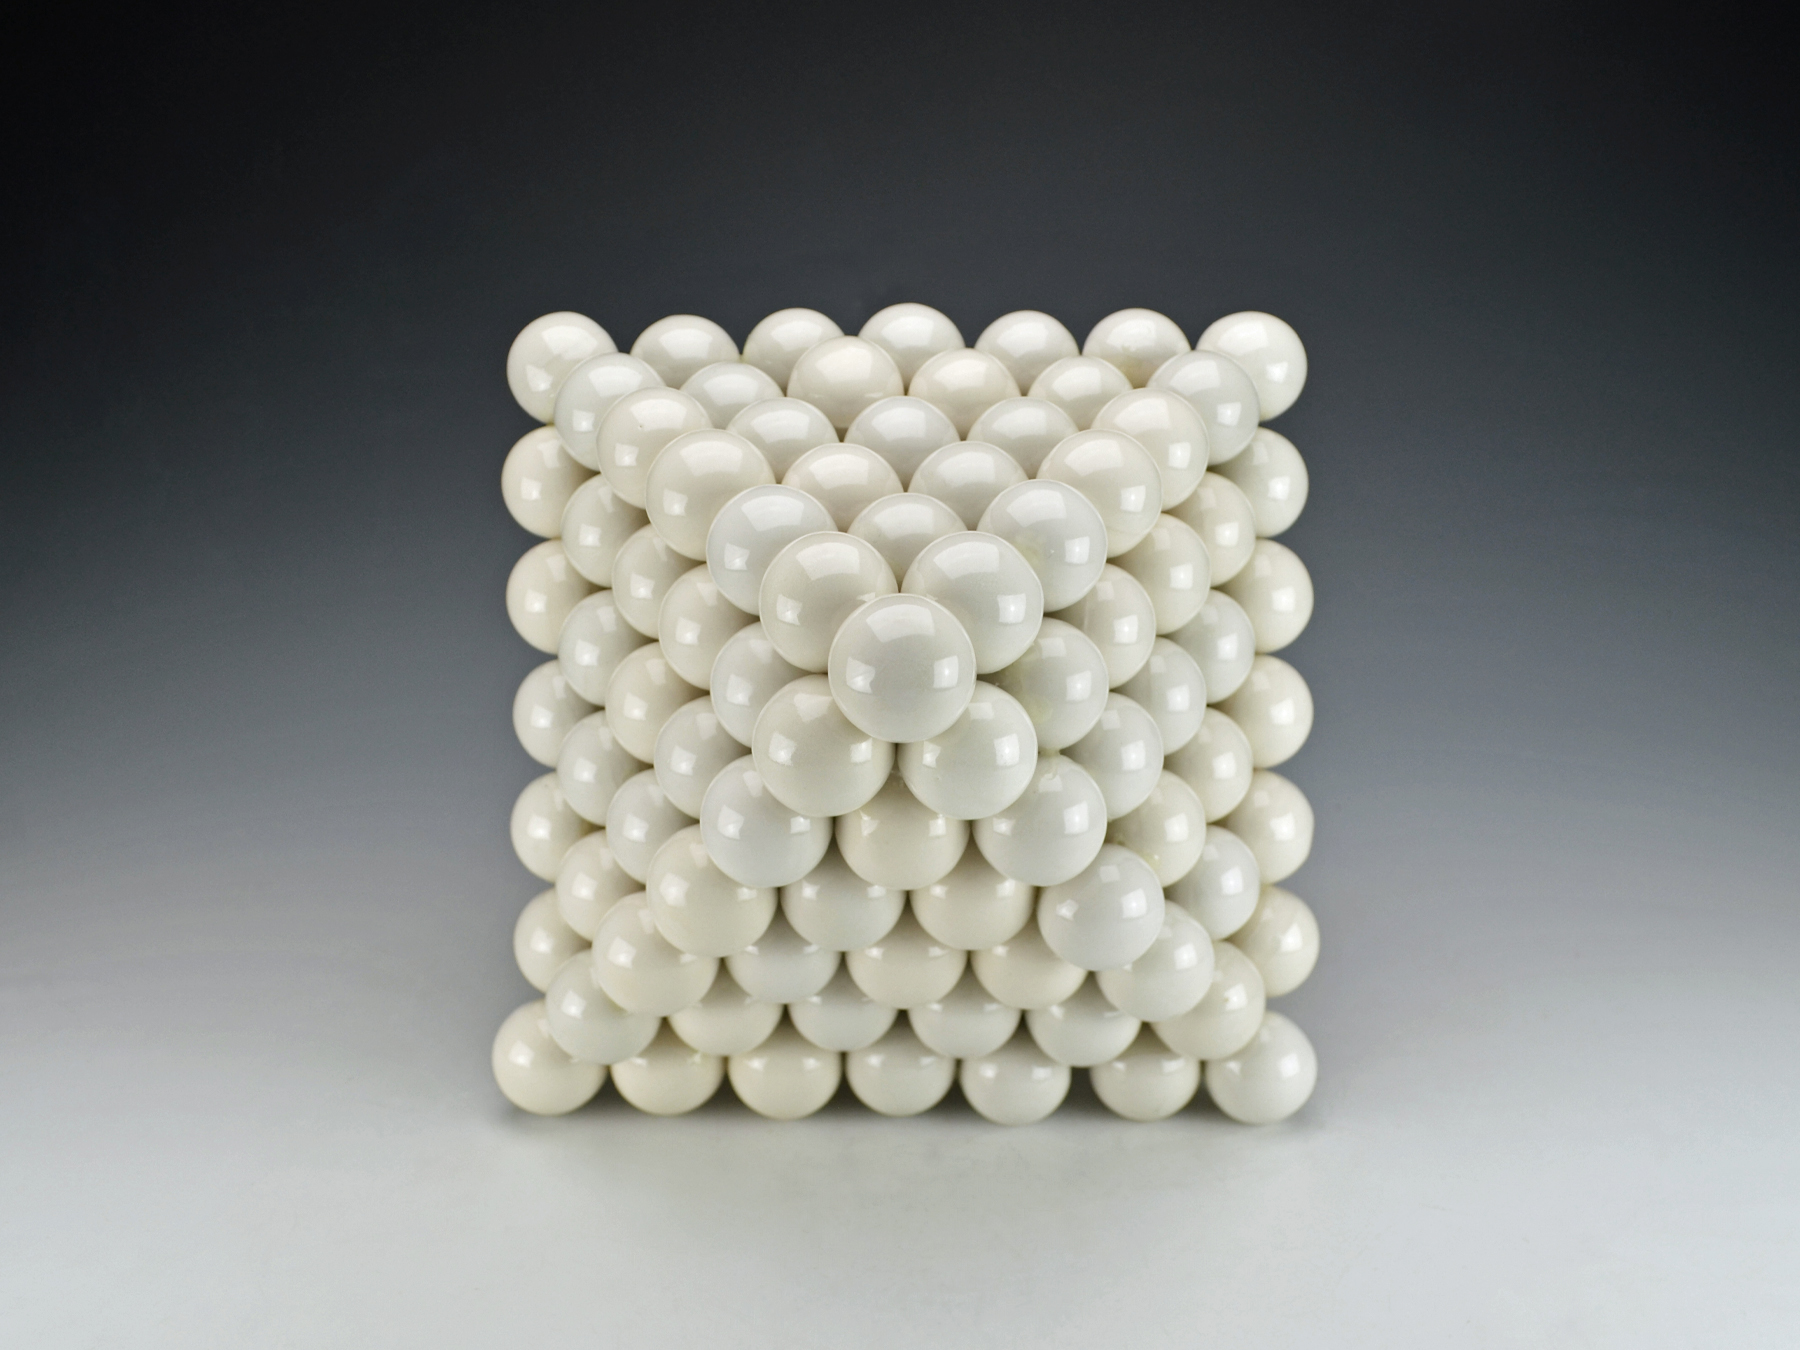 Ionic Series: Octahedron  |  13 x 13 x 16 inches  |  Porcelain, Glaze  |  2017